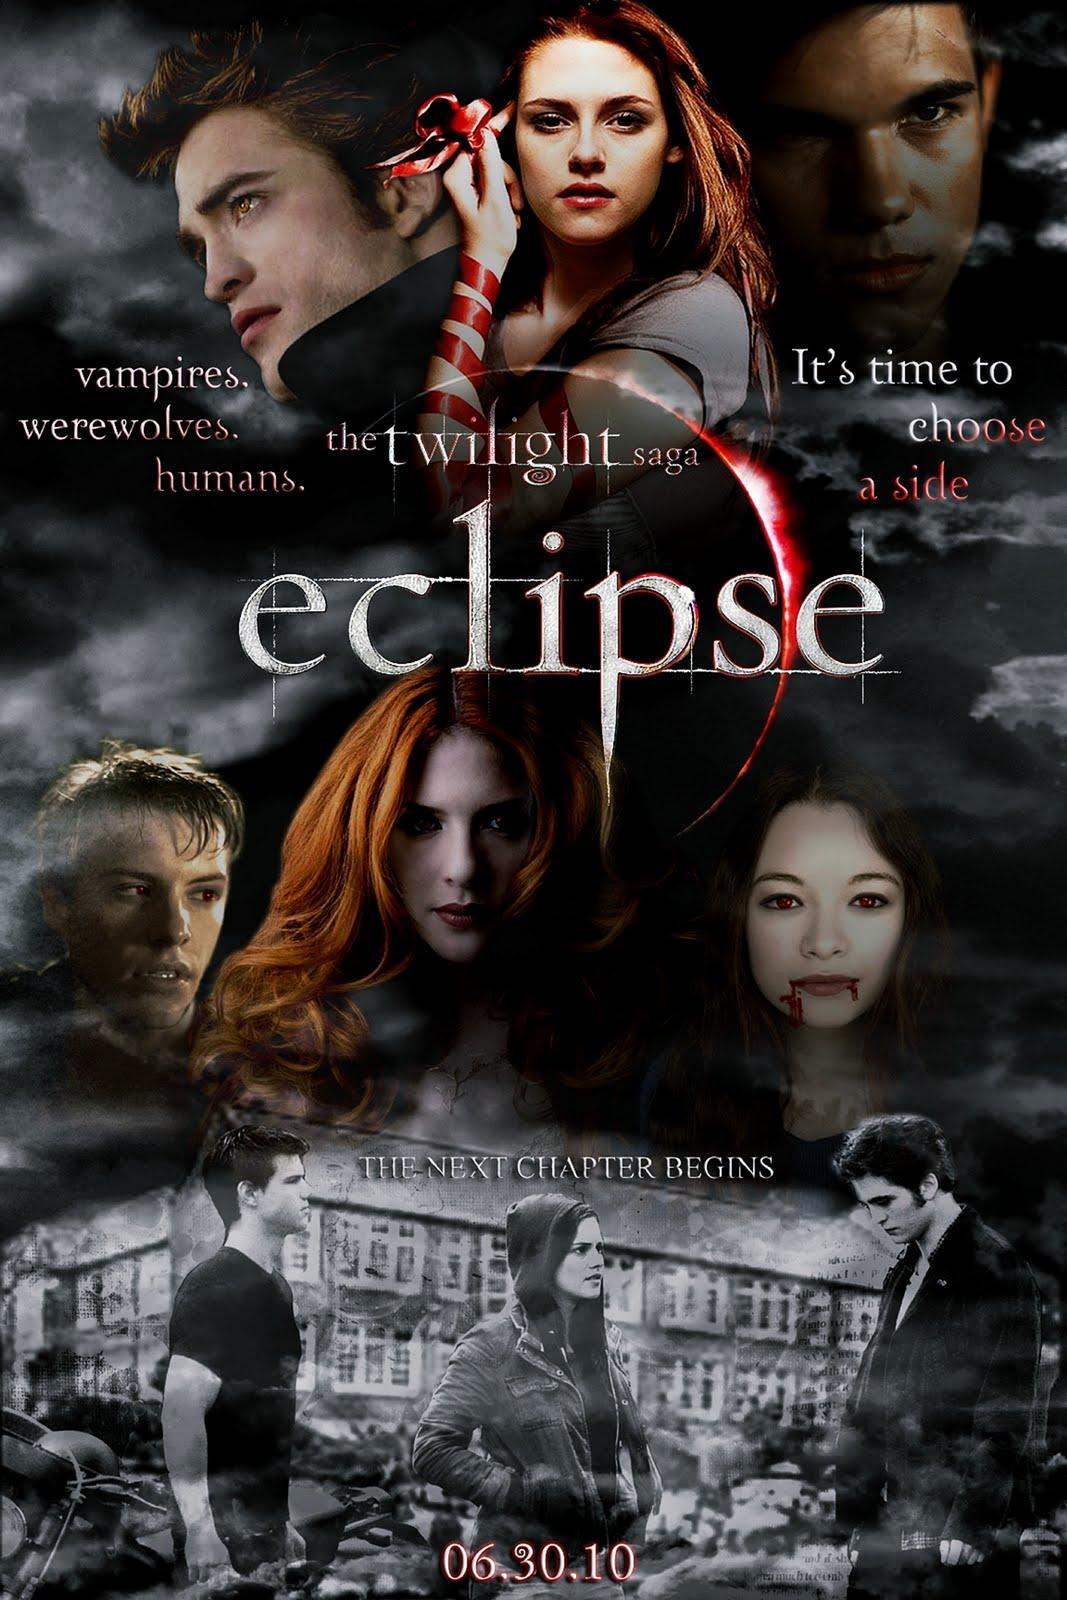 http://3.bp.blogspot.com/_JOIzlznQDJc/TCXCUQBmmiI/AAAAAAAABNU/aIDjqUpbHZA/s1600/Poster-Twilight-Saga-Eclipse-Fanmade-twilight-series-9477225-1152-1728.jpg